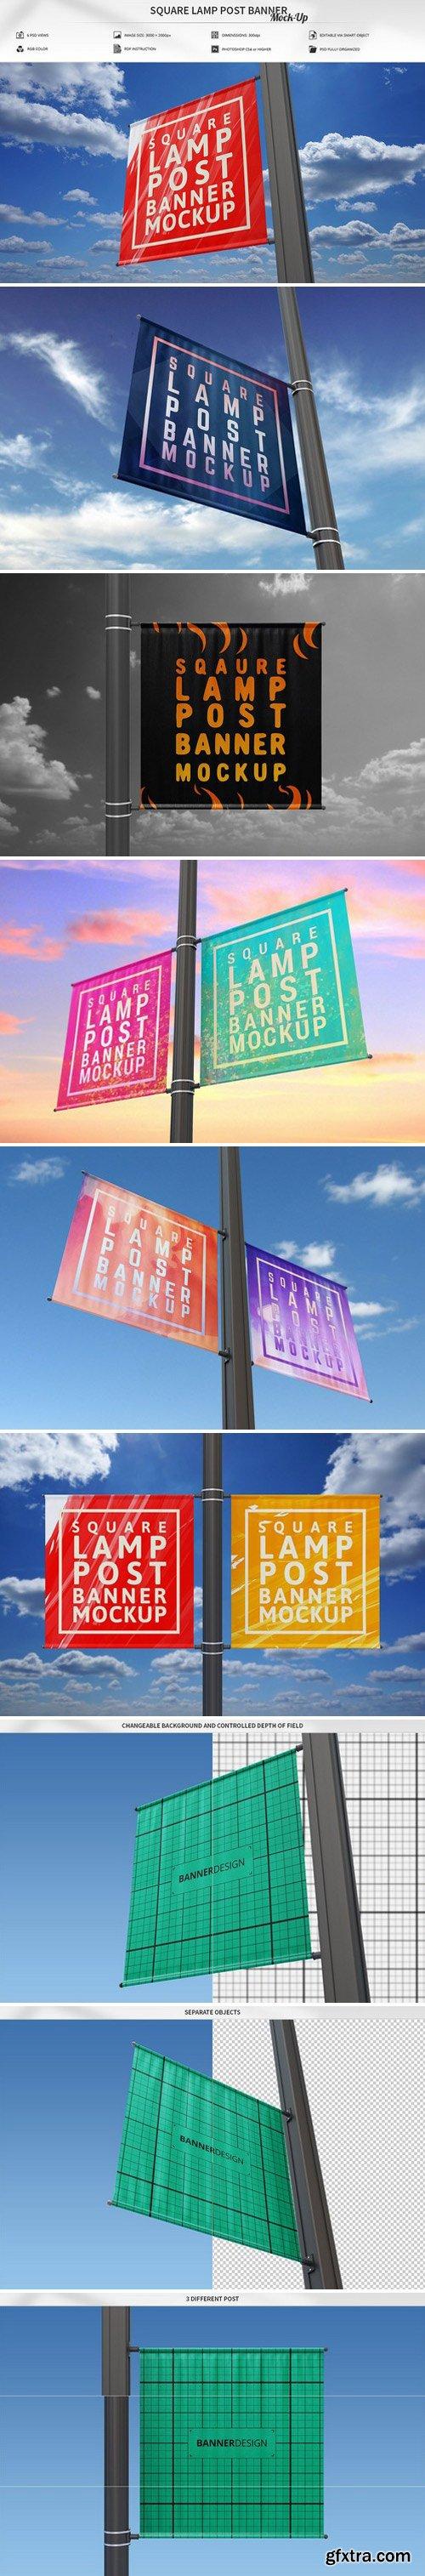 CM - Square Lamp Post Banner Mock-Up 2358620